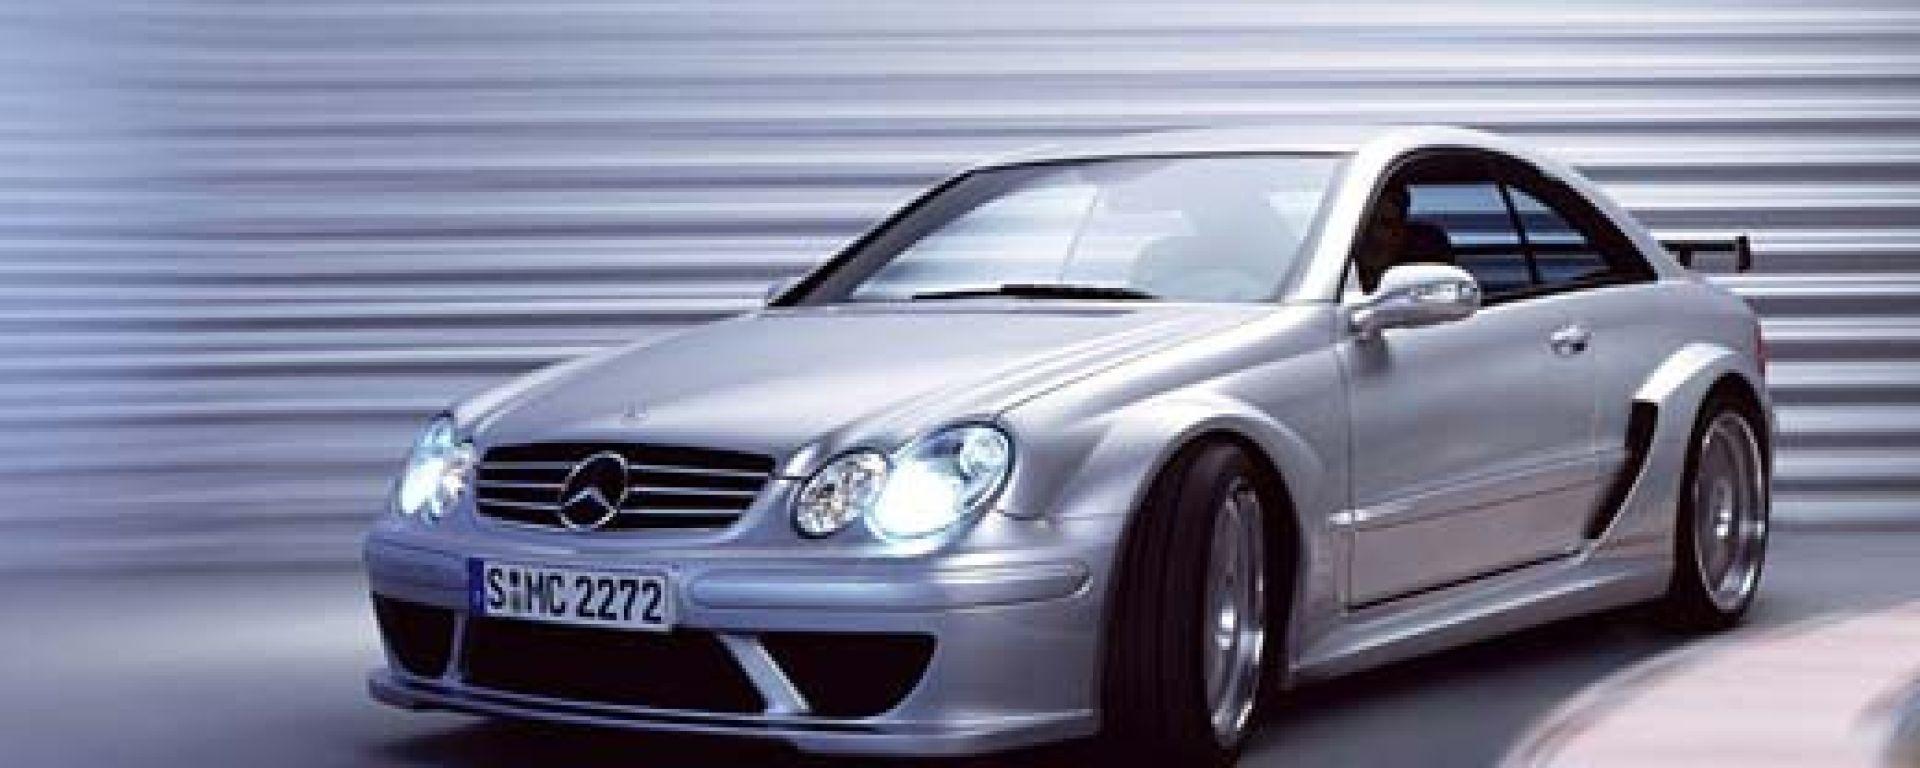 Anteprima: Mercedes CLK DTM AMG